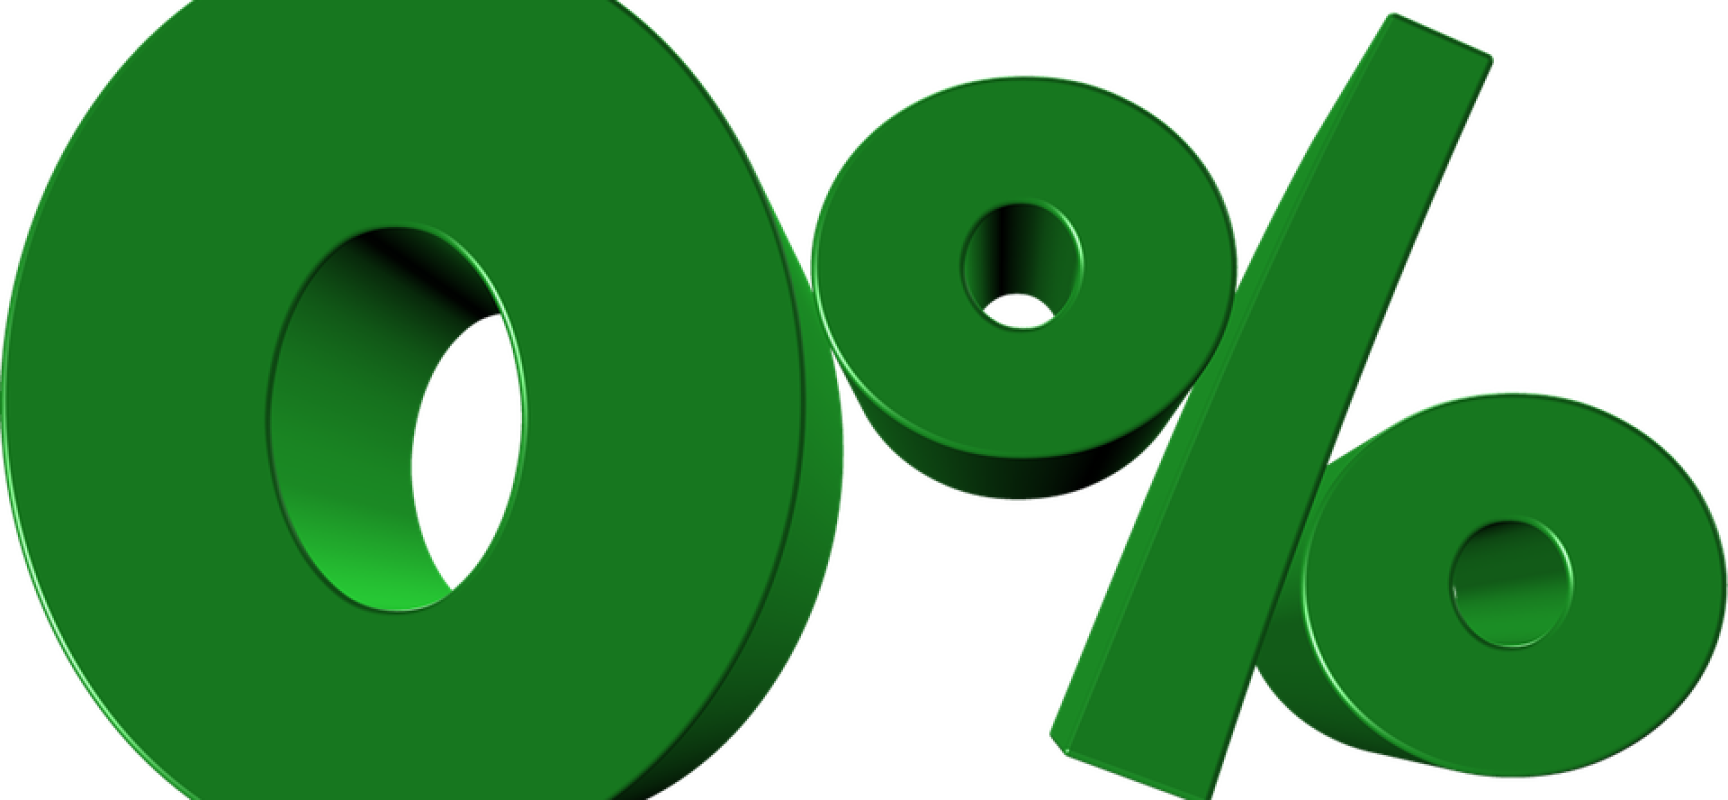 Nullzins-Niveau nützt Konsumenten